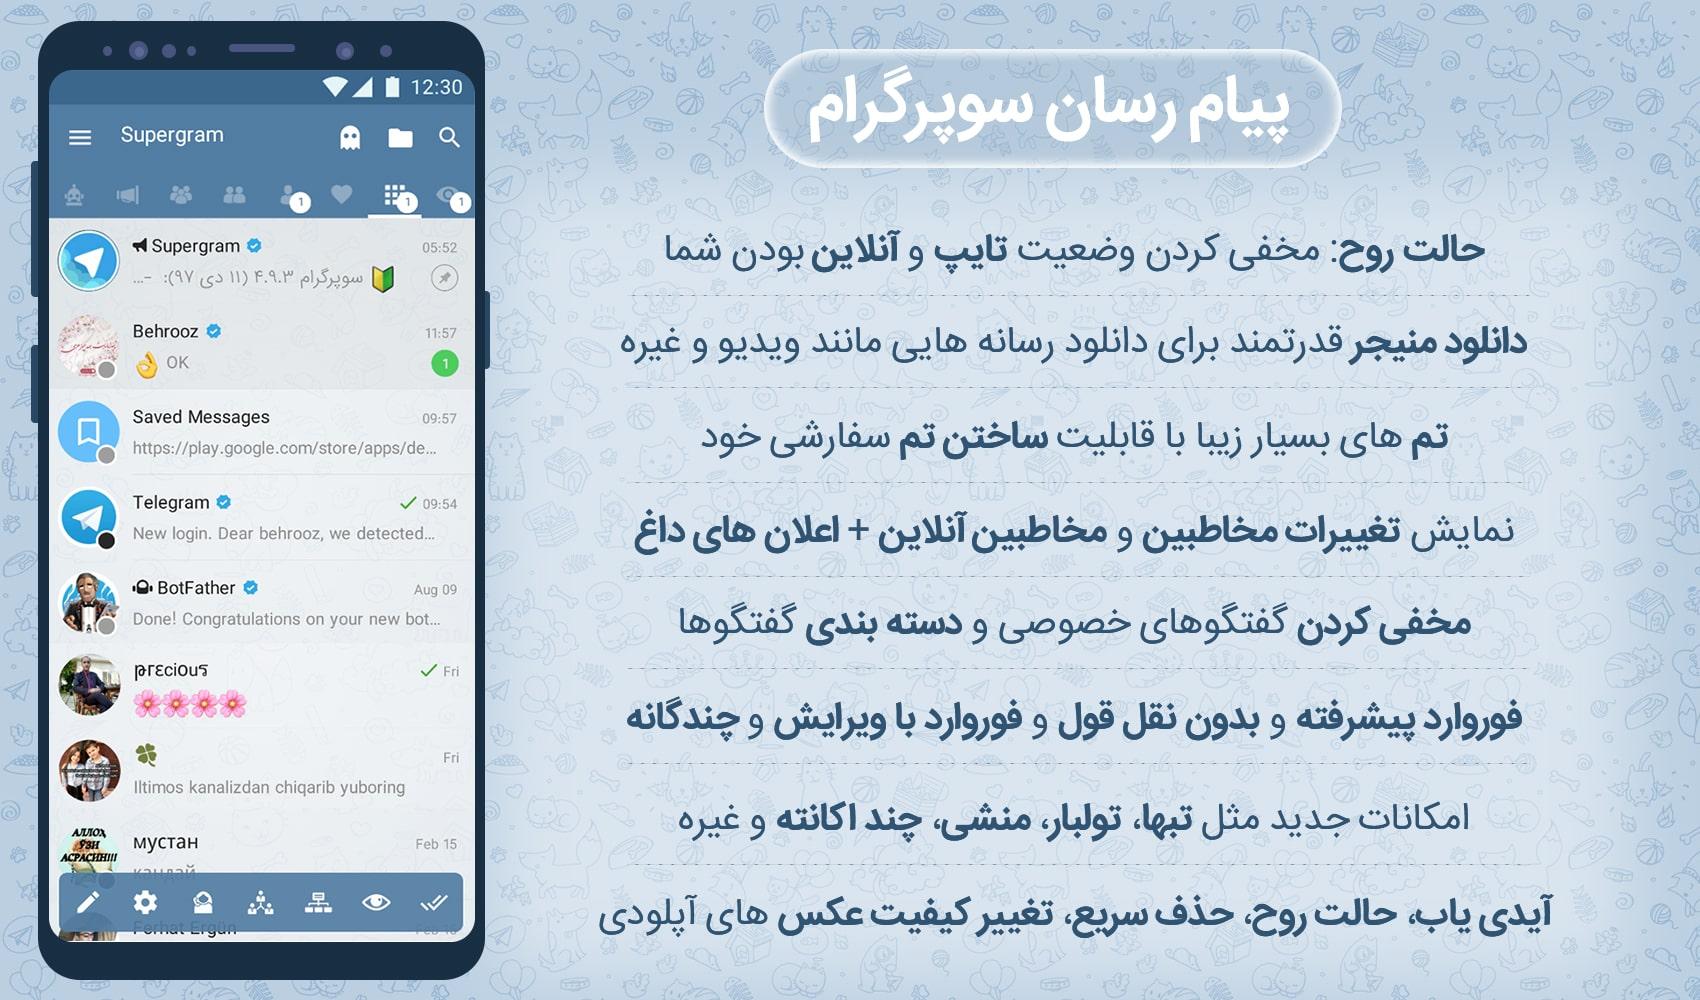 سورس تلگرام غیر رسمی - سورس سوپرگرام